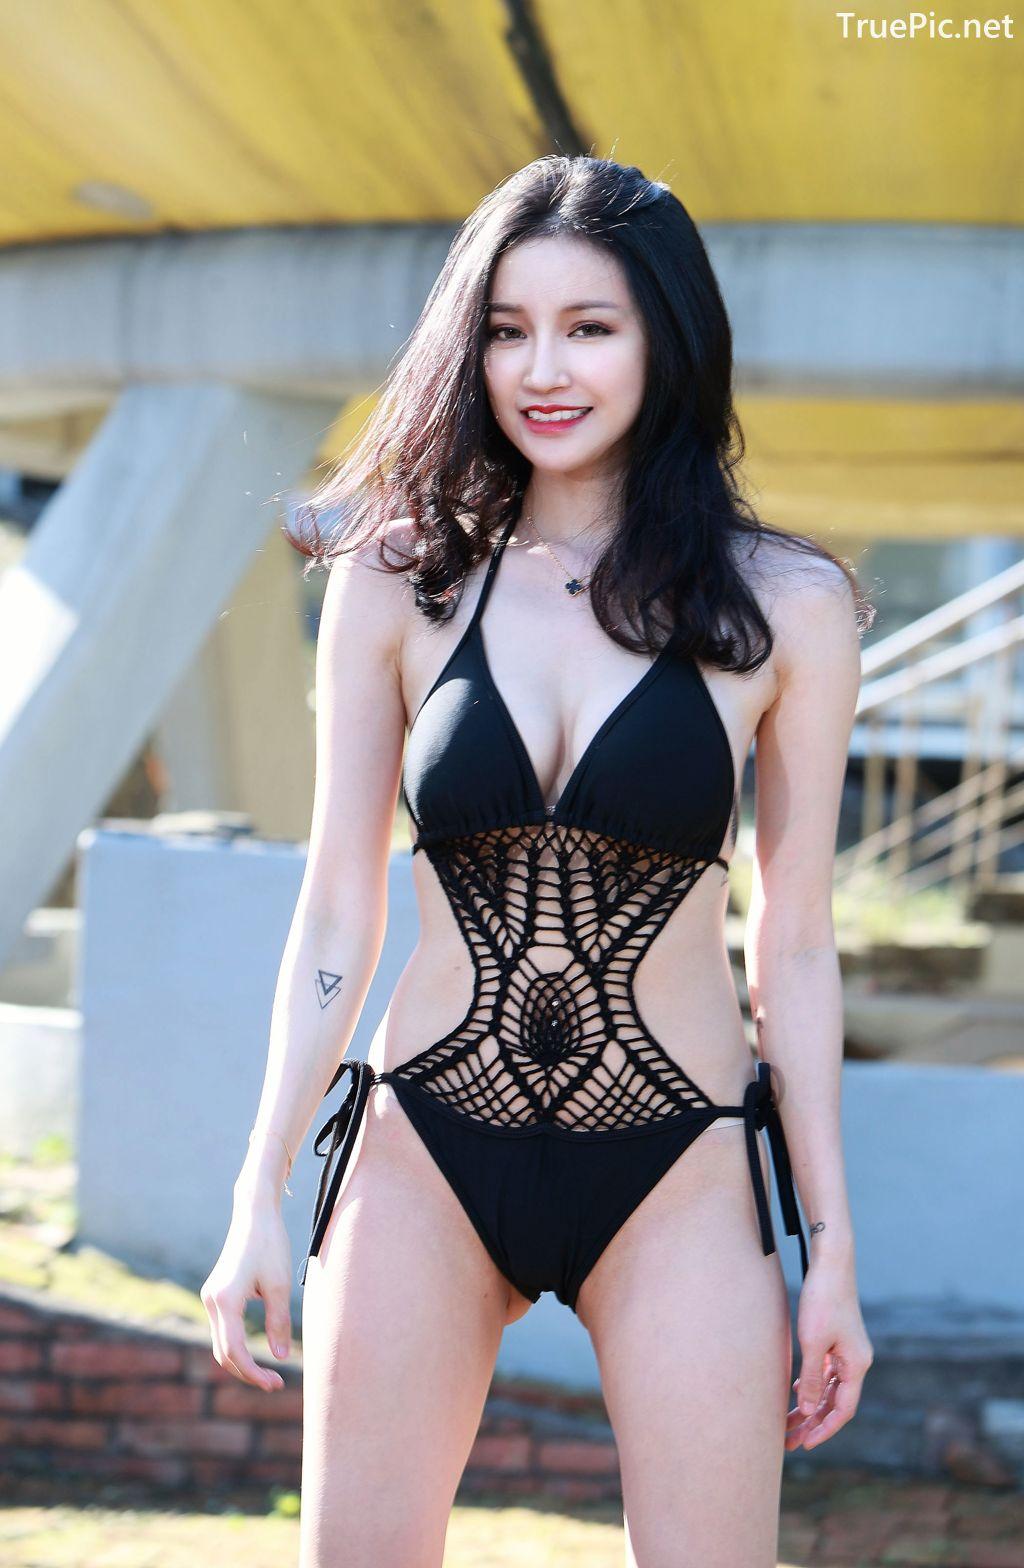 Image-Taiwanese-Model-艾薉-Long-Legs-And-Lovely-Bikini-Girl-TruePic.net- Picture-8